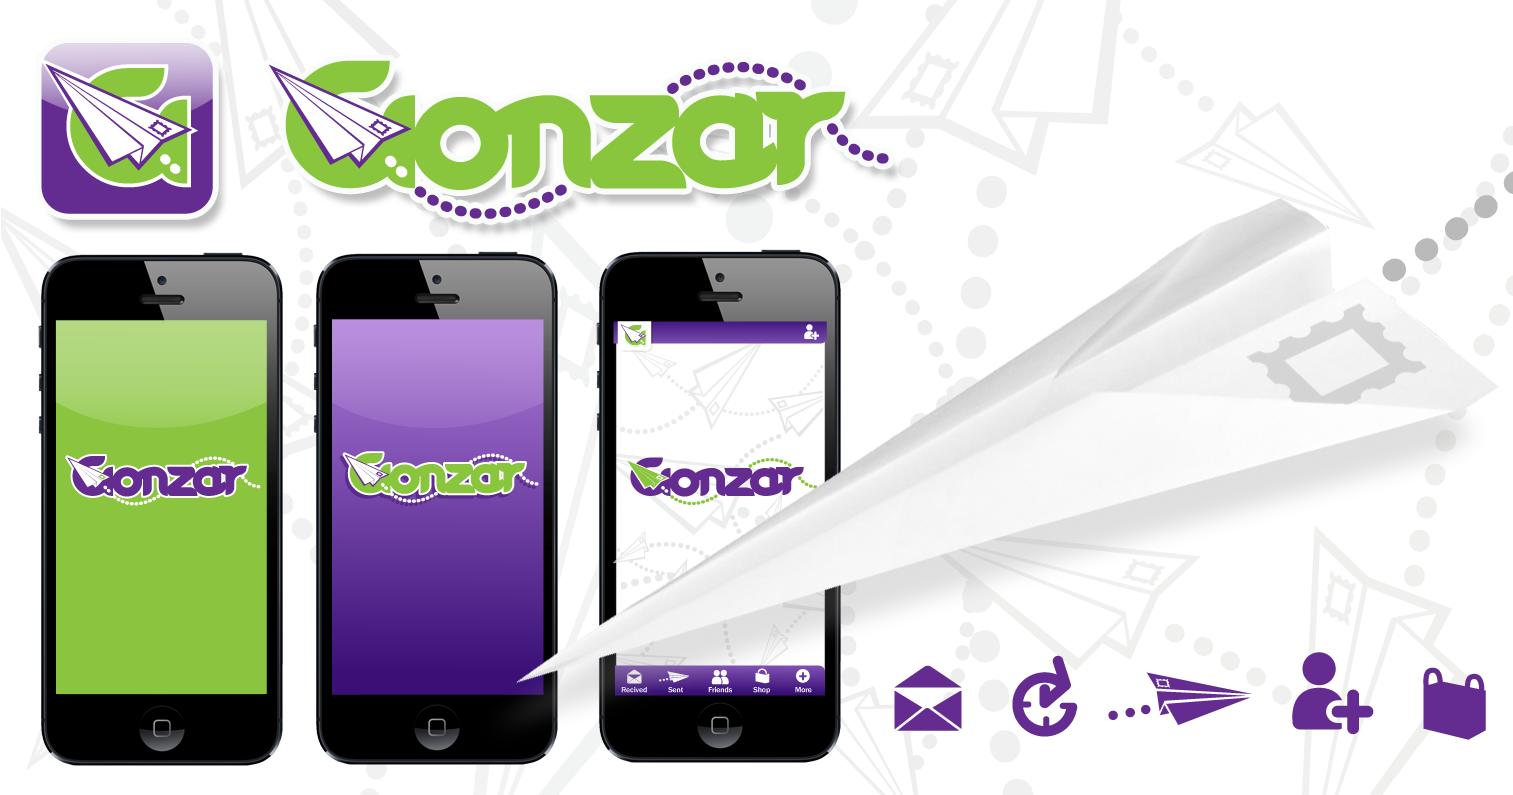 gonzar-template.png